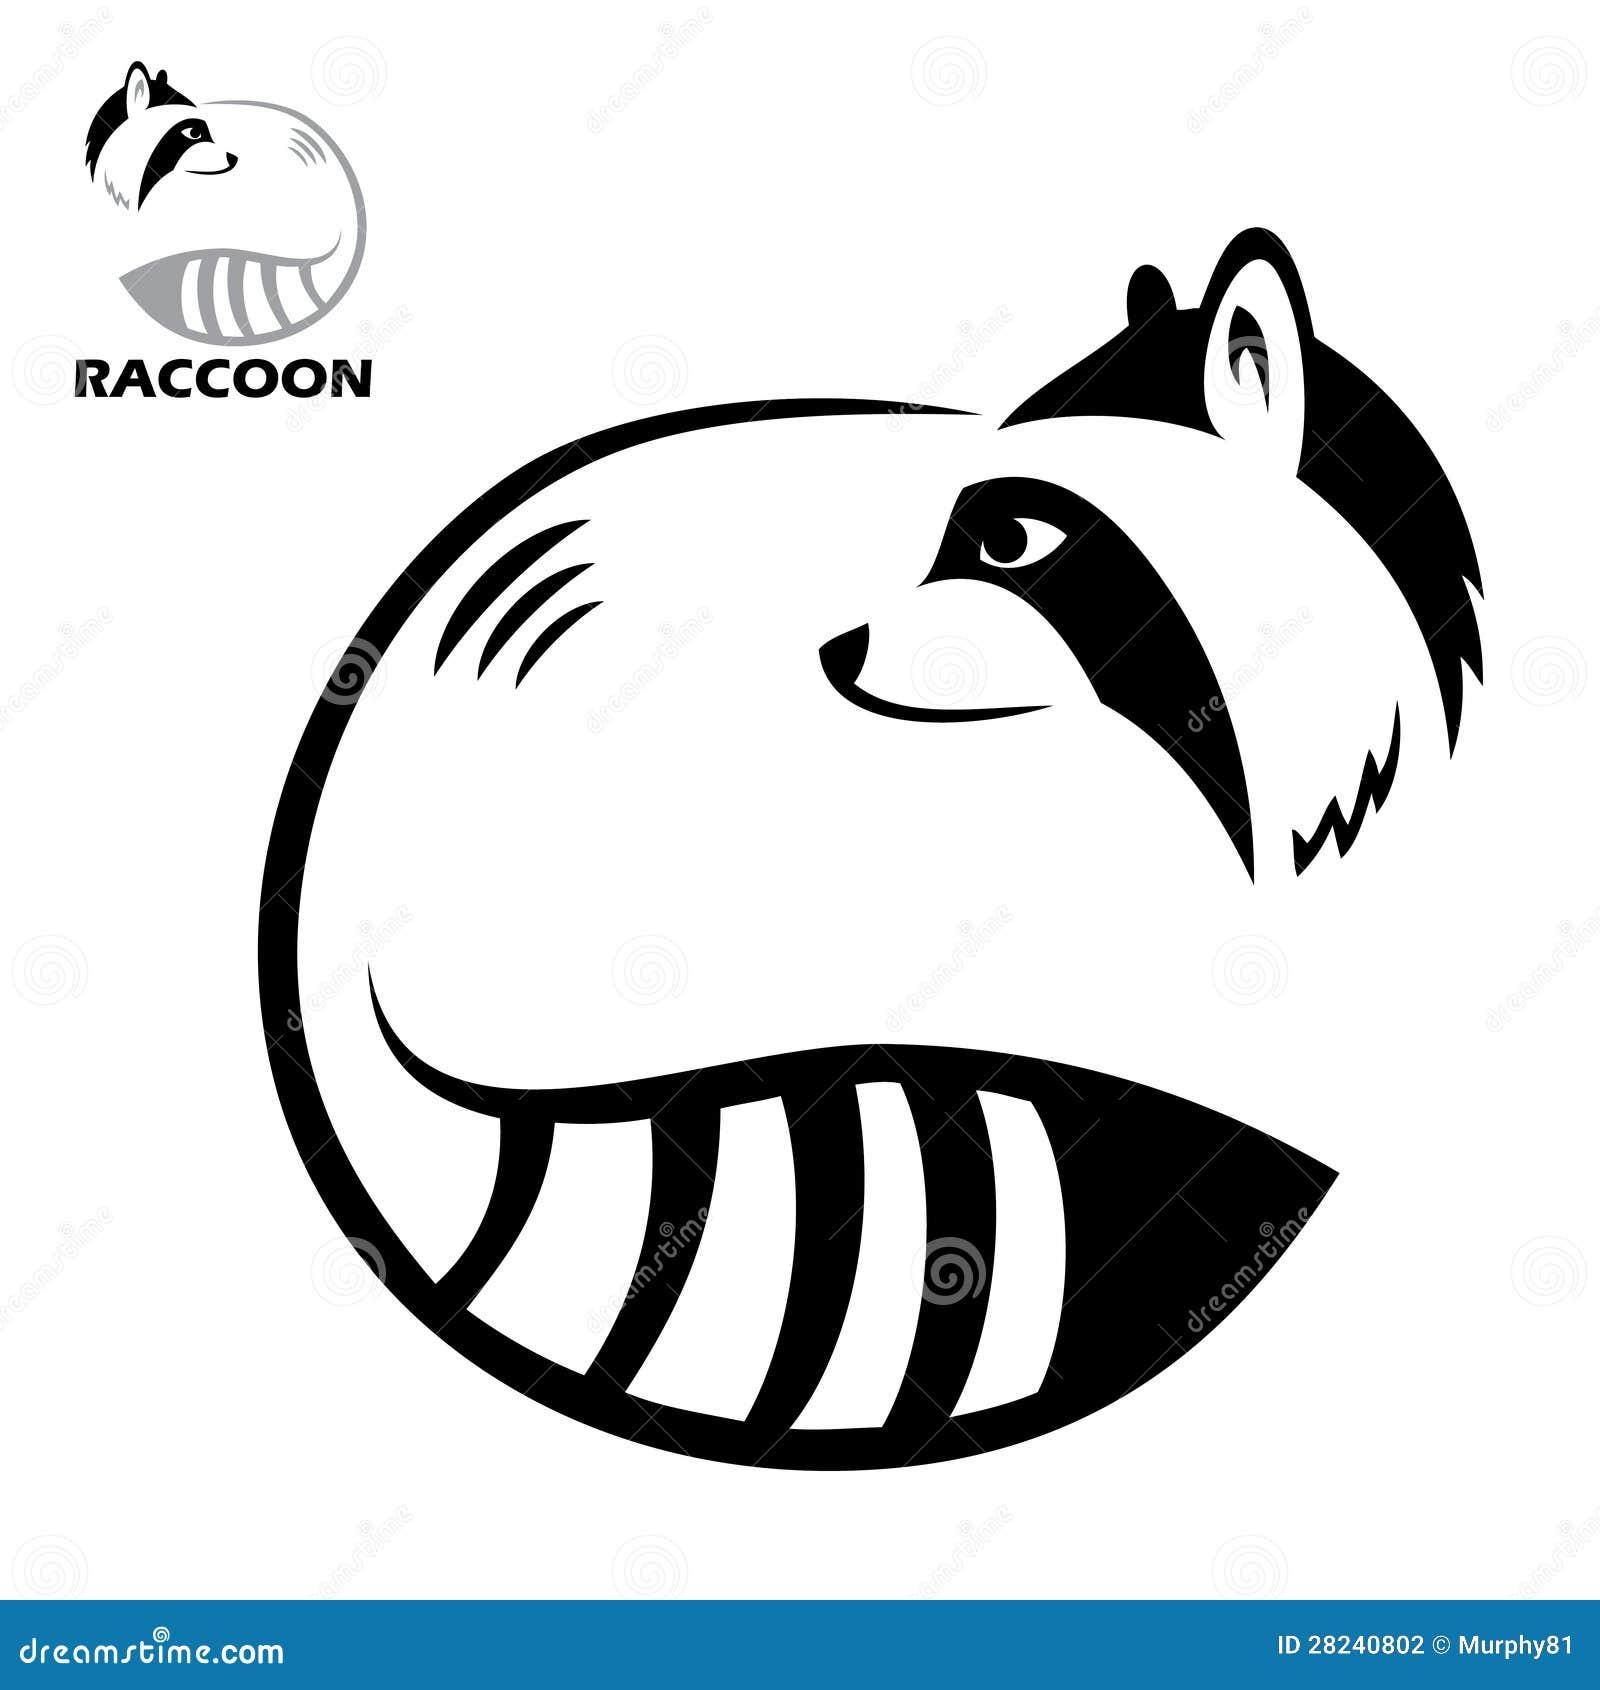 Raccoon Label Stock Photography - Image: 28240802 Raccoon Face Clip Art